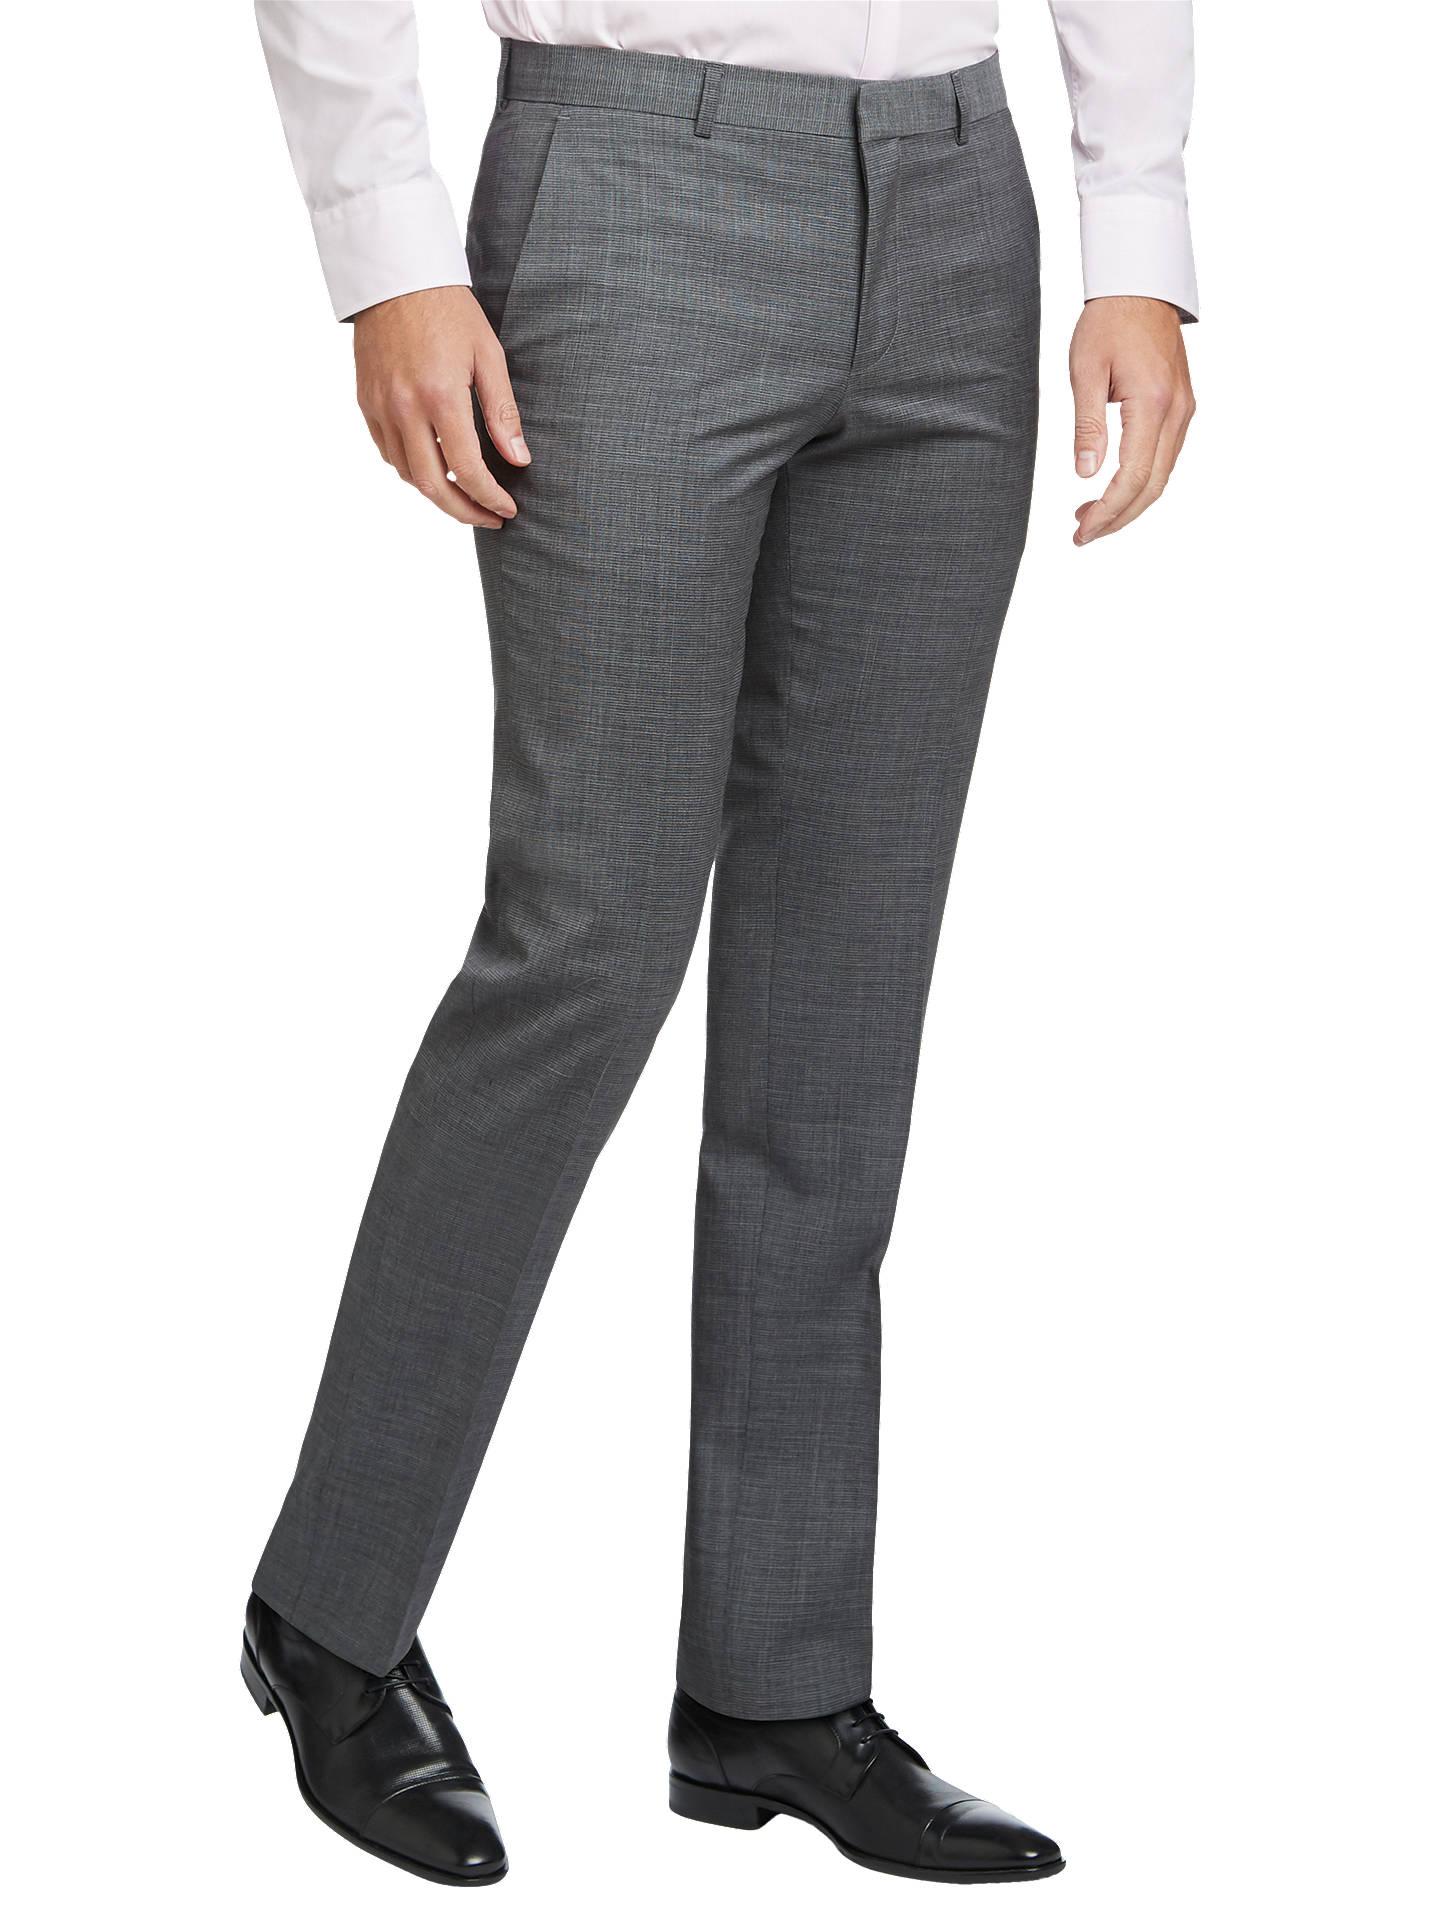 c2068eb09 Buy HUGO by Hugo Boss Henry/Griffin Virgin Wool Slim Fit Suit Trousers,  Open ...